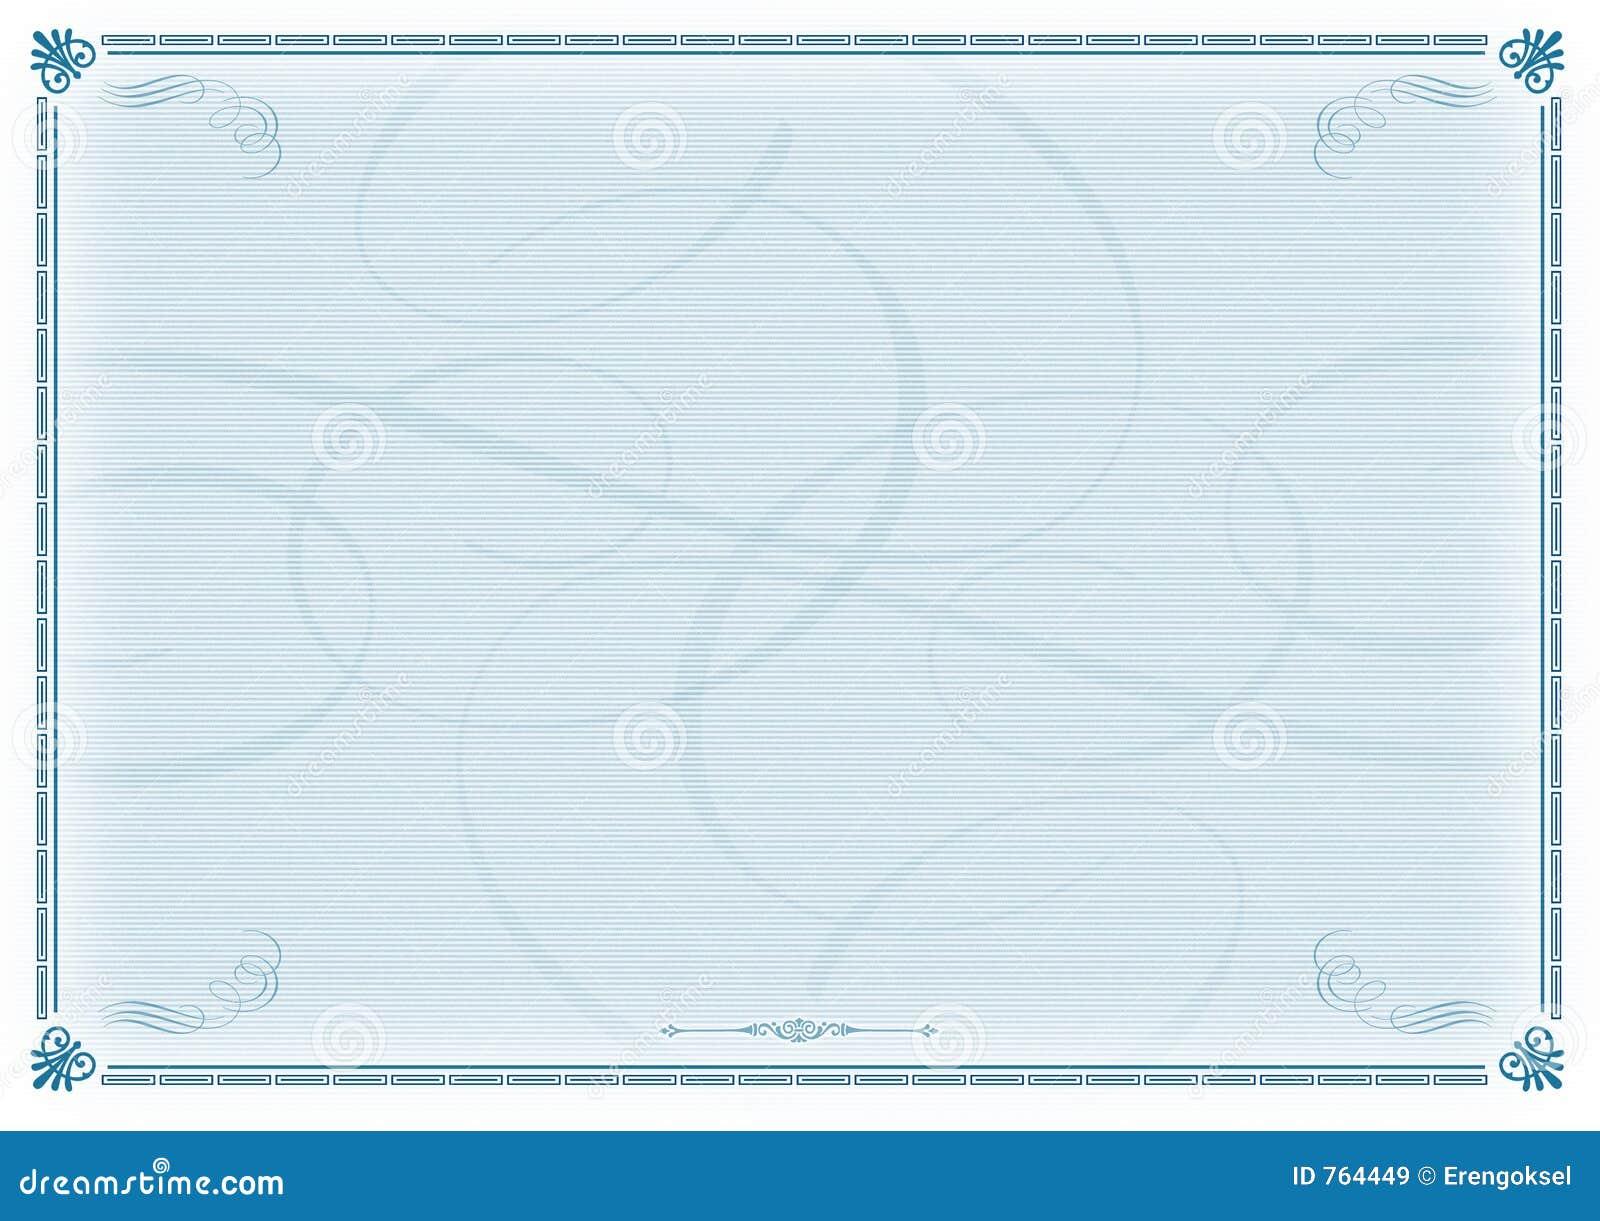 free blank training certificate template